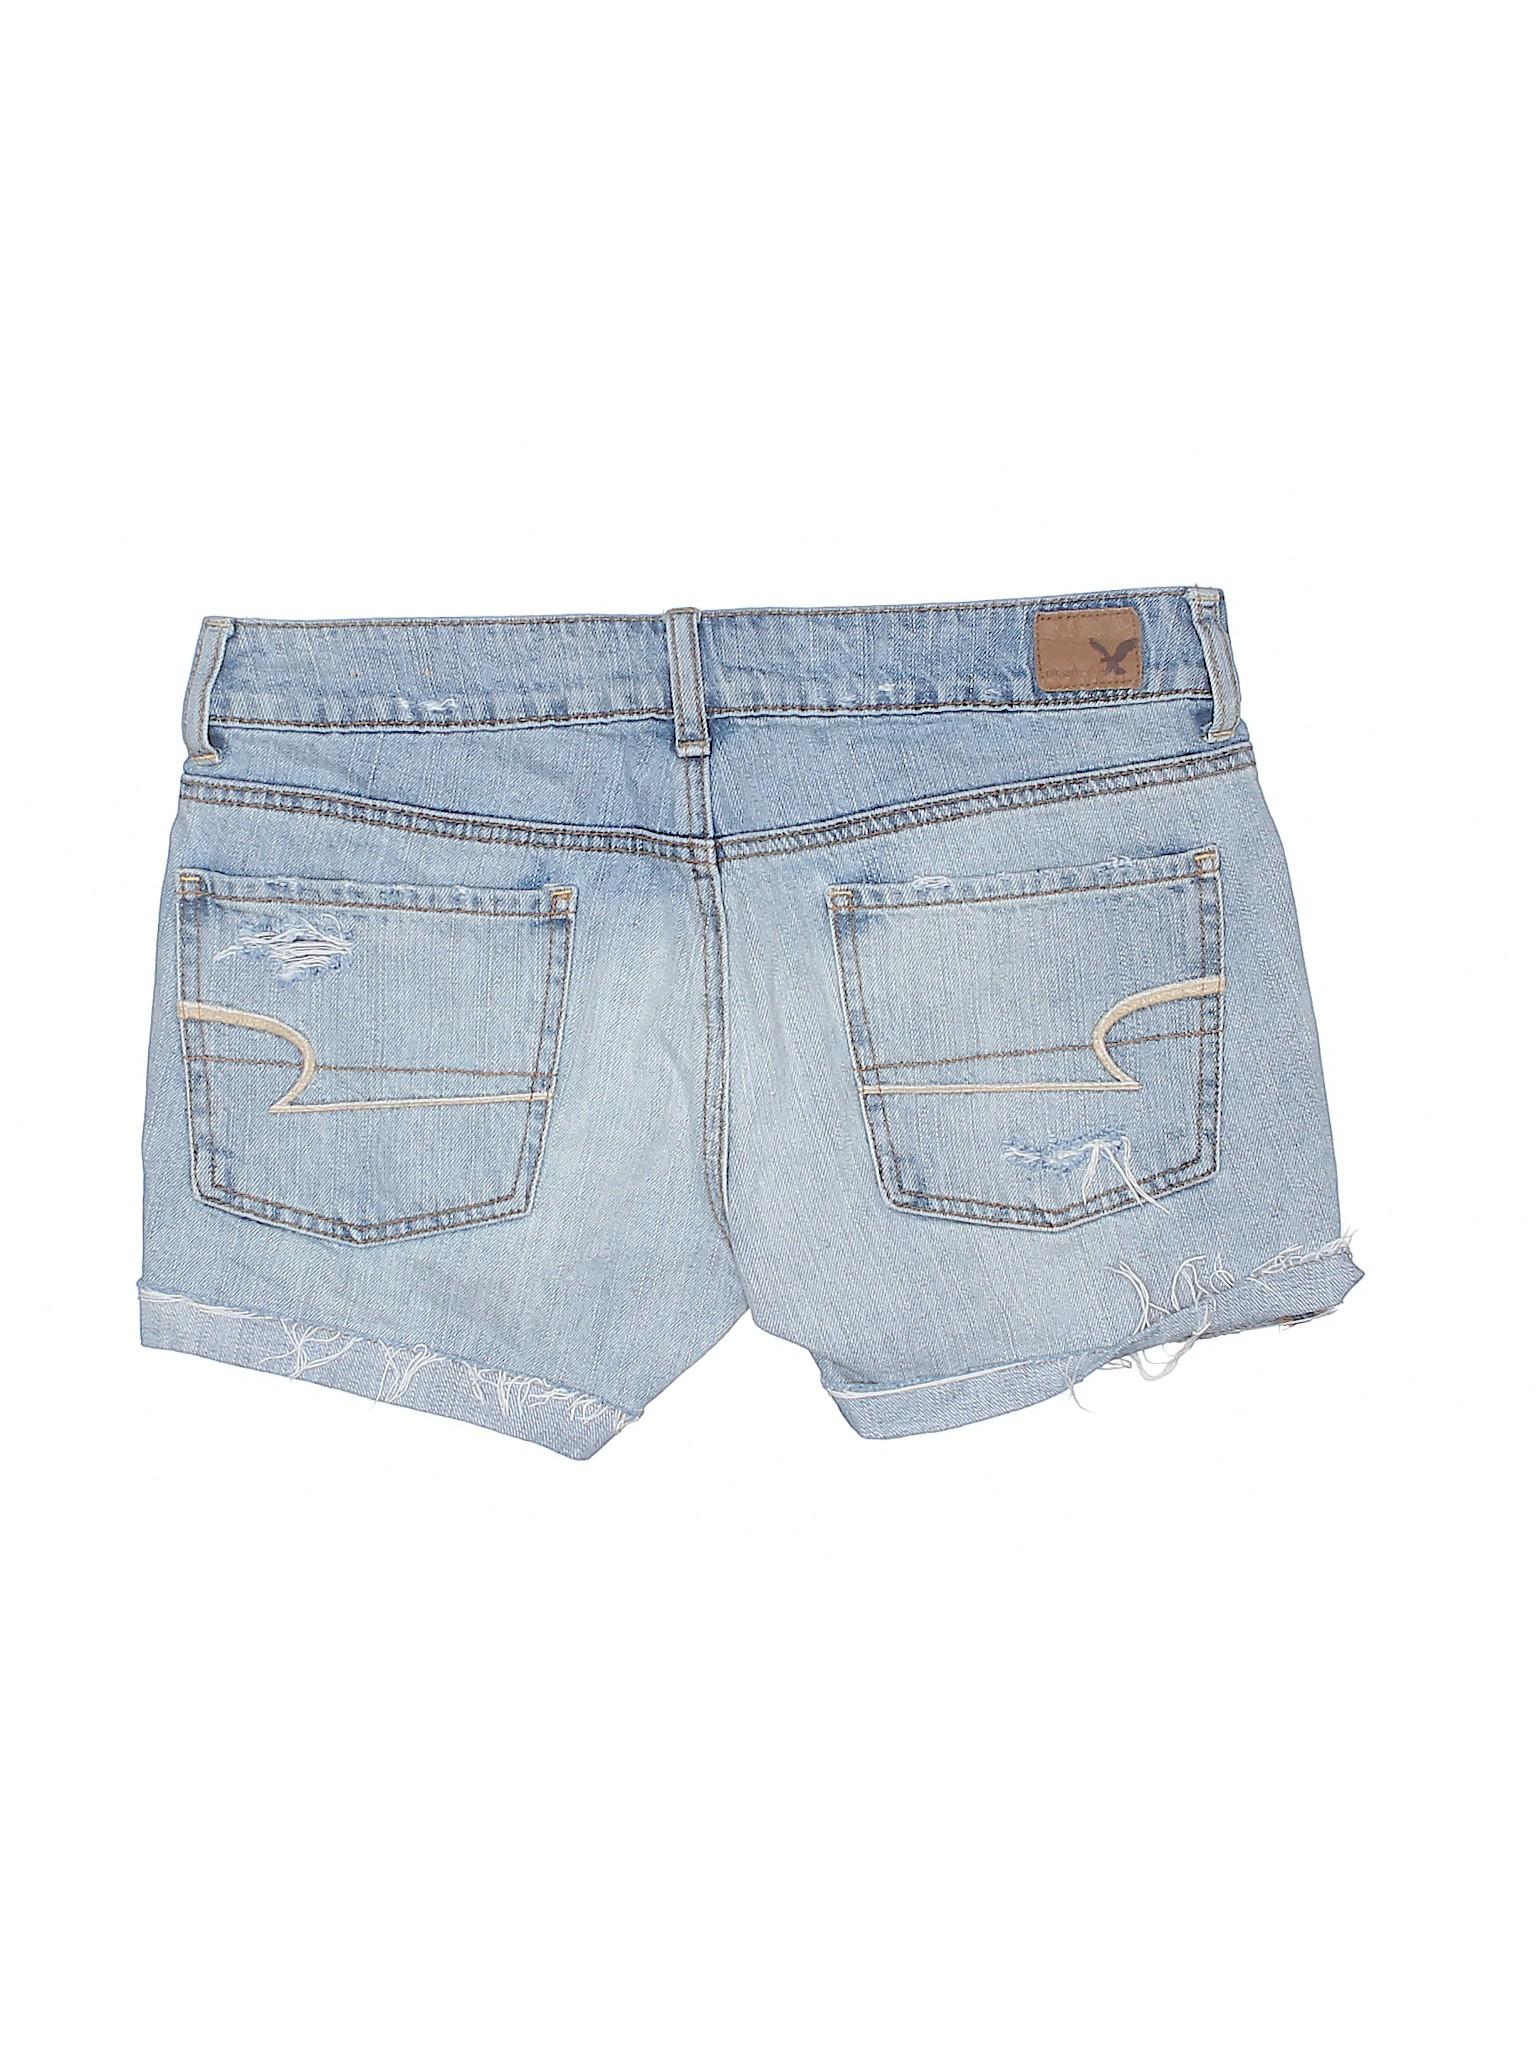 Shorts Outfitters Boutique American Eagle Denim I8qwxza6q